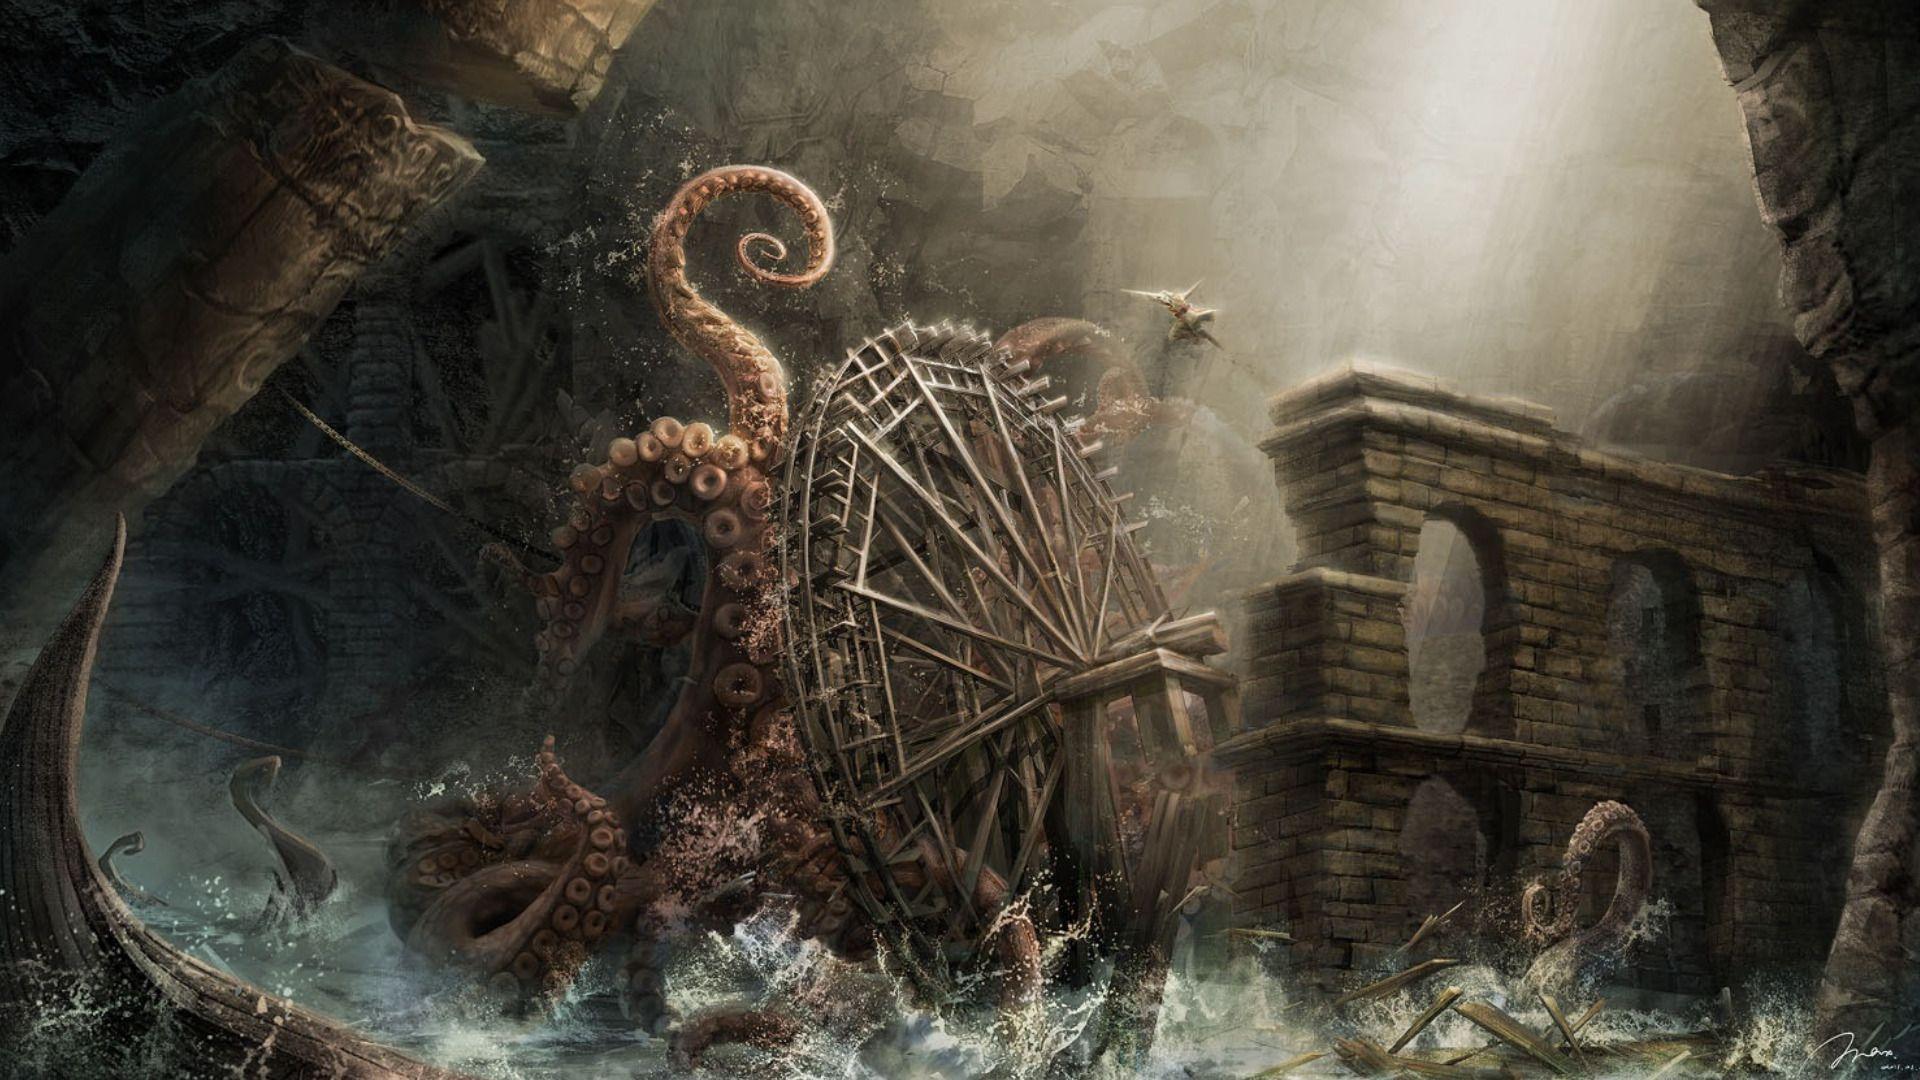 Fantasy Kraken Wallpaper Kraken Octopus Pictures Mythical Creatures